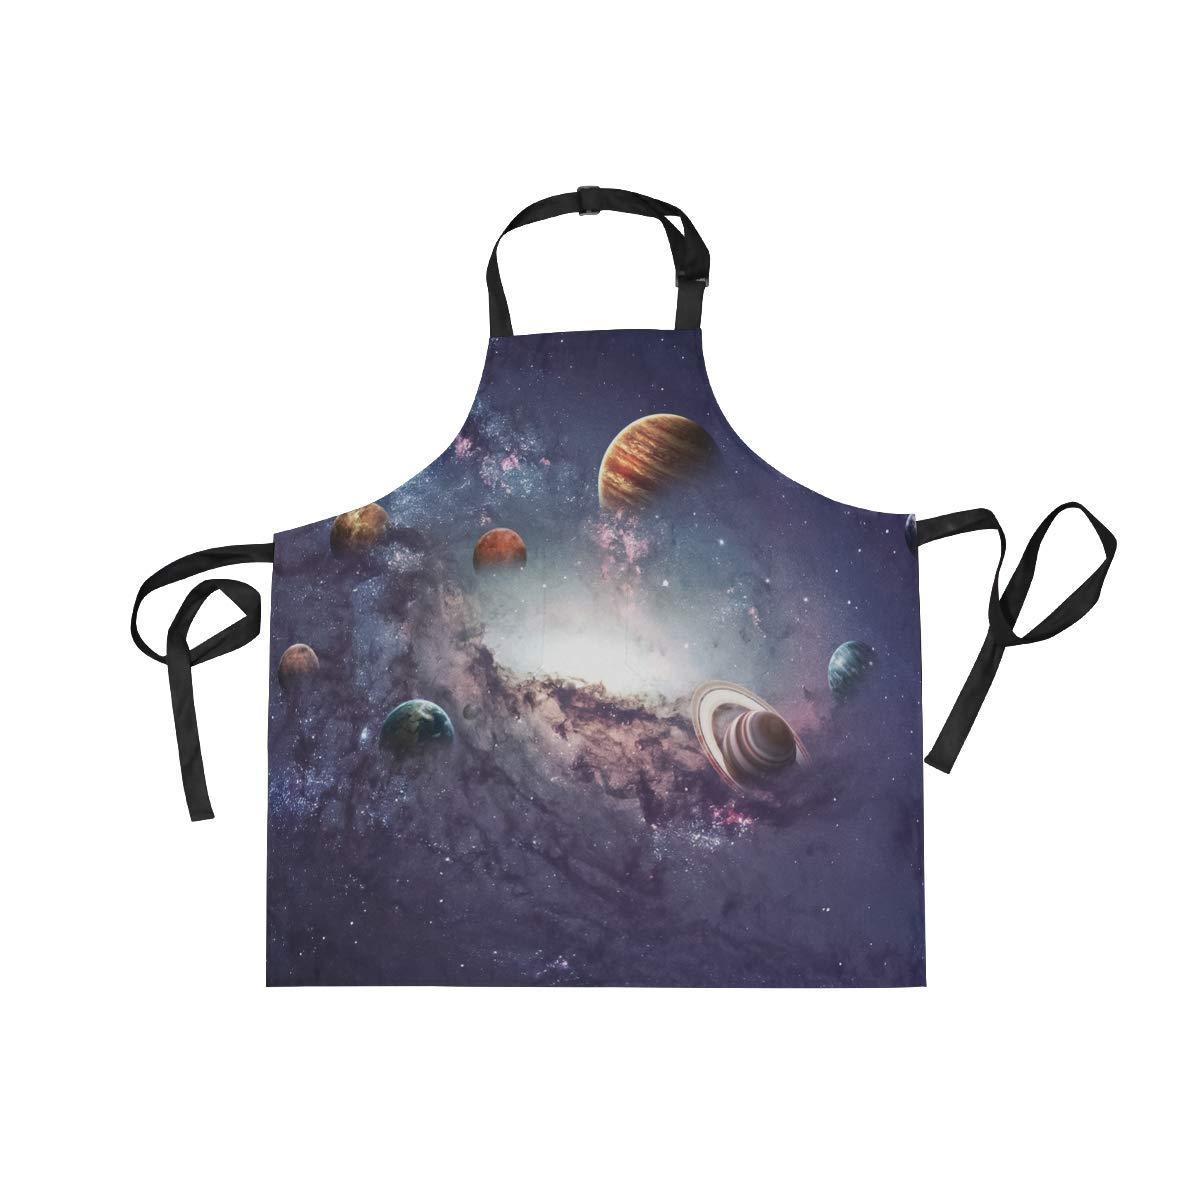 Adult Kitchen Aprons Majestic Universe Solar System Nebula Galaxy Bib Apron with Pockets for Women Men Adjustable Neck Apron Cooking Baking or Kitchen Gardening Unisex Apron,Twill,Multi-Pattern